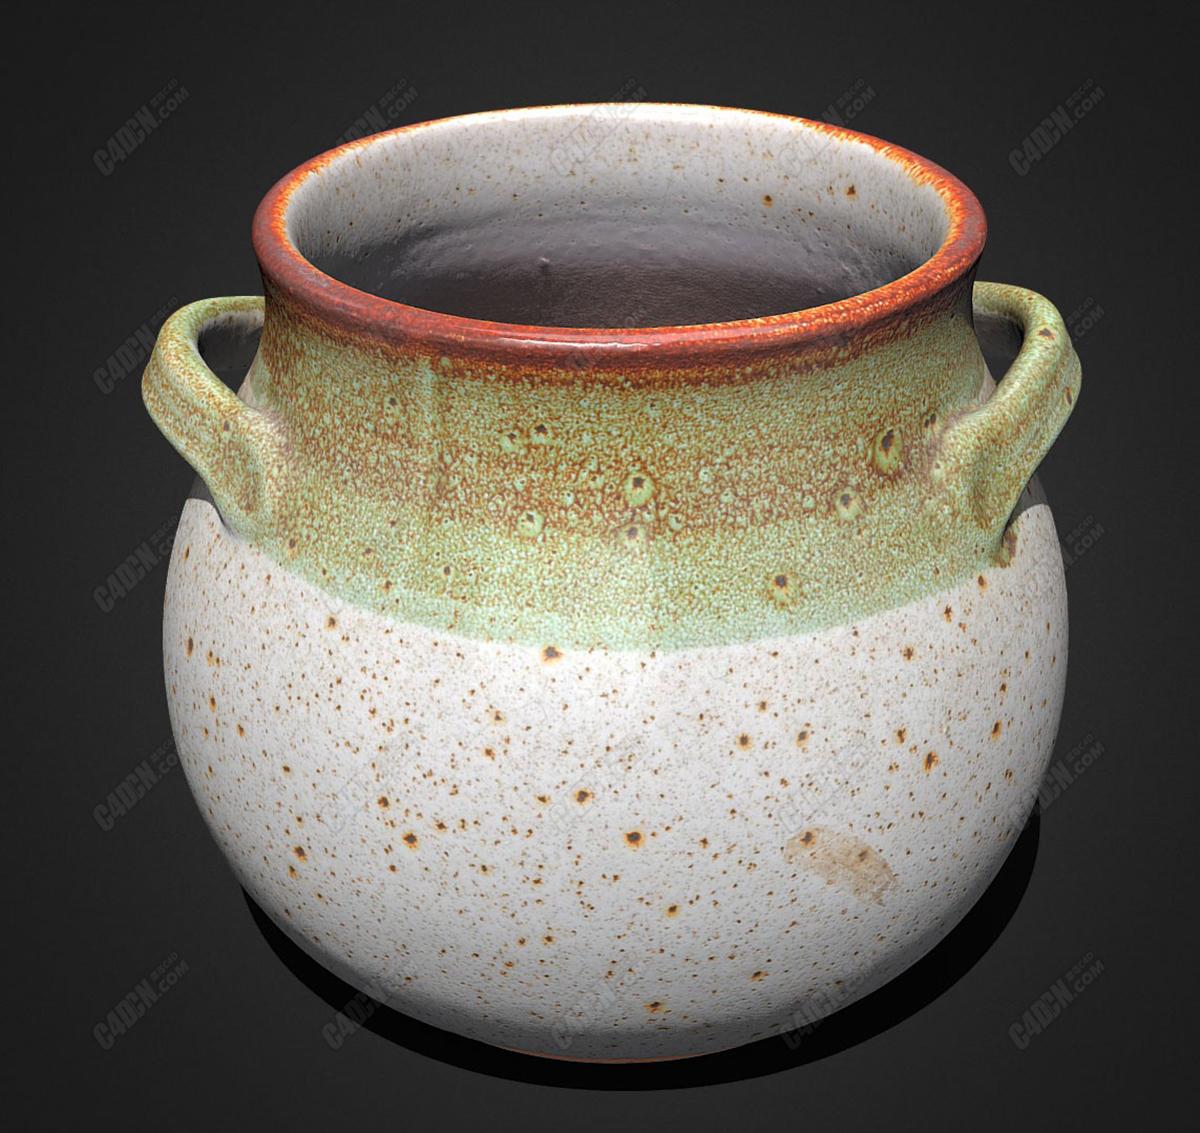 C4D陶瓷器皿模型-花瓶 vaso